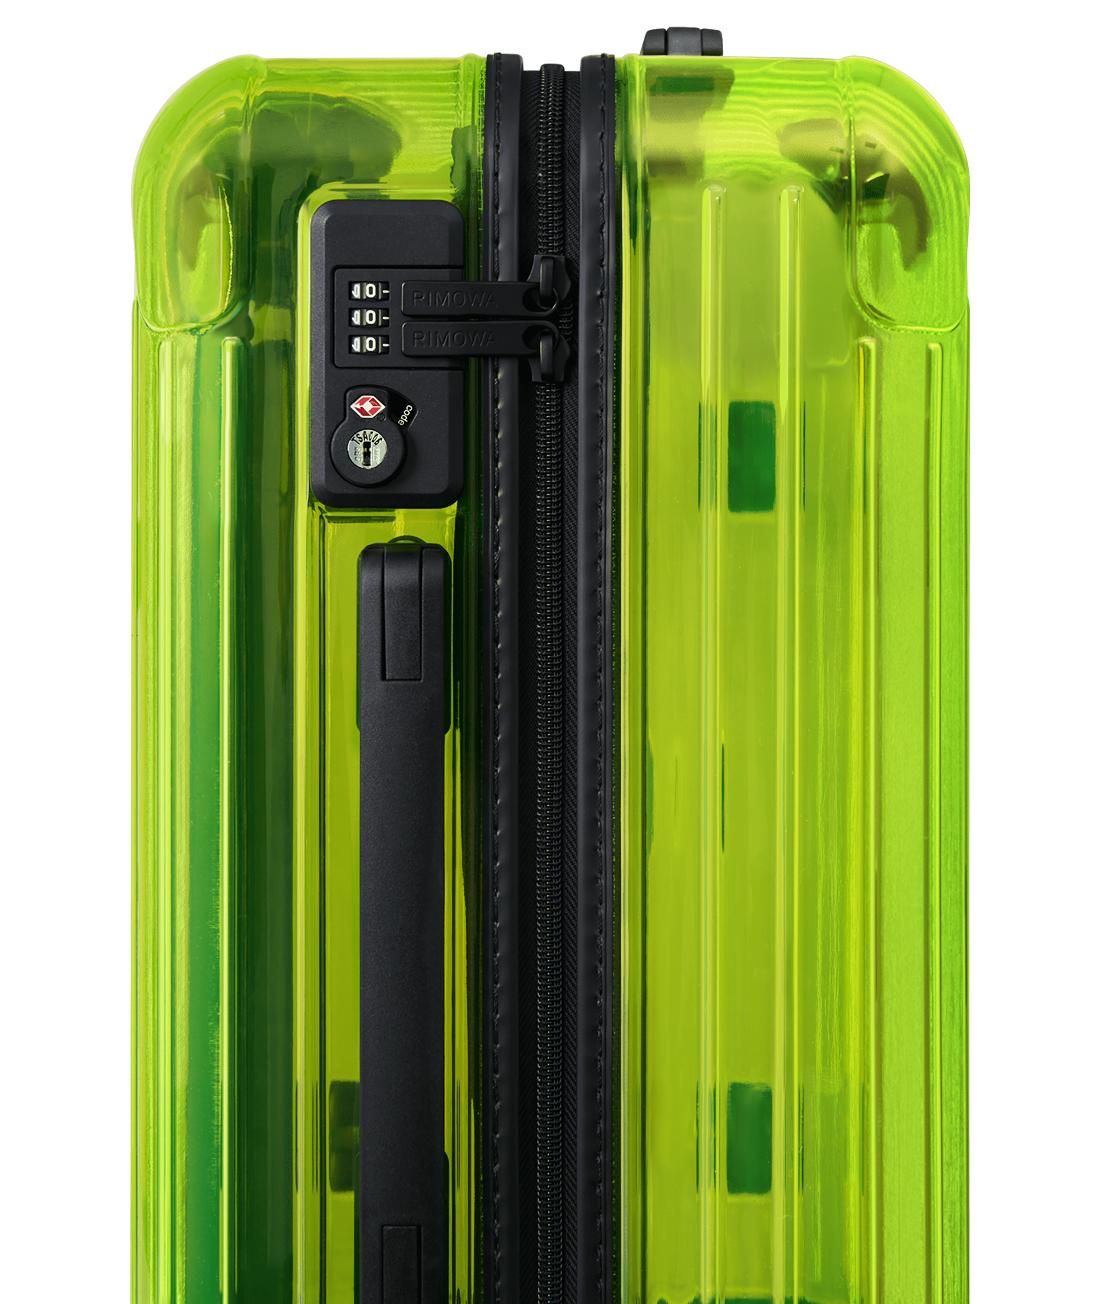 , New RIMOWA Neon Travel Suitcase Collection, Saubio Making Wealth